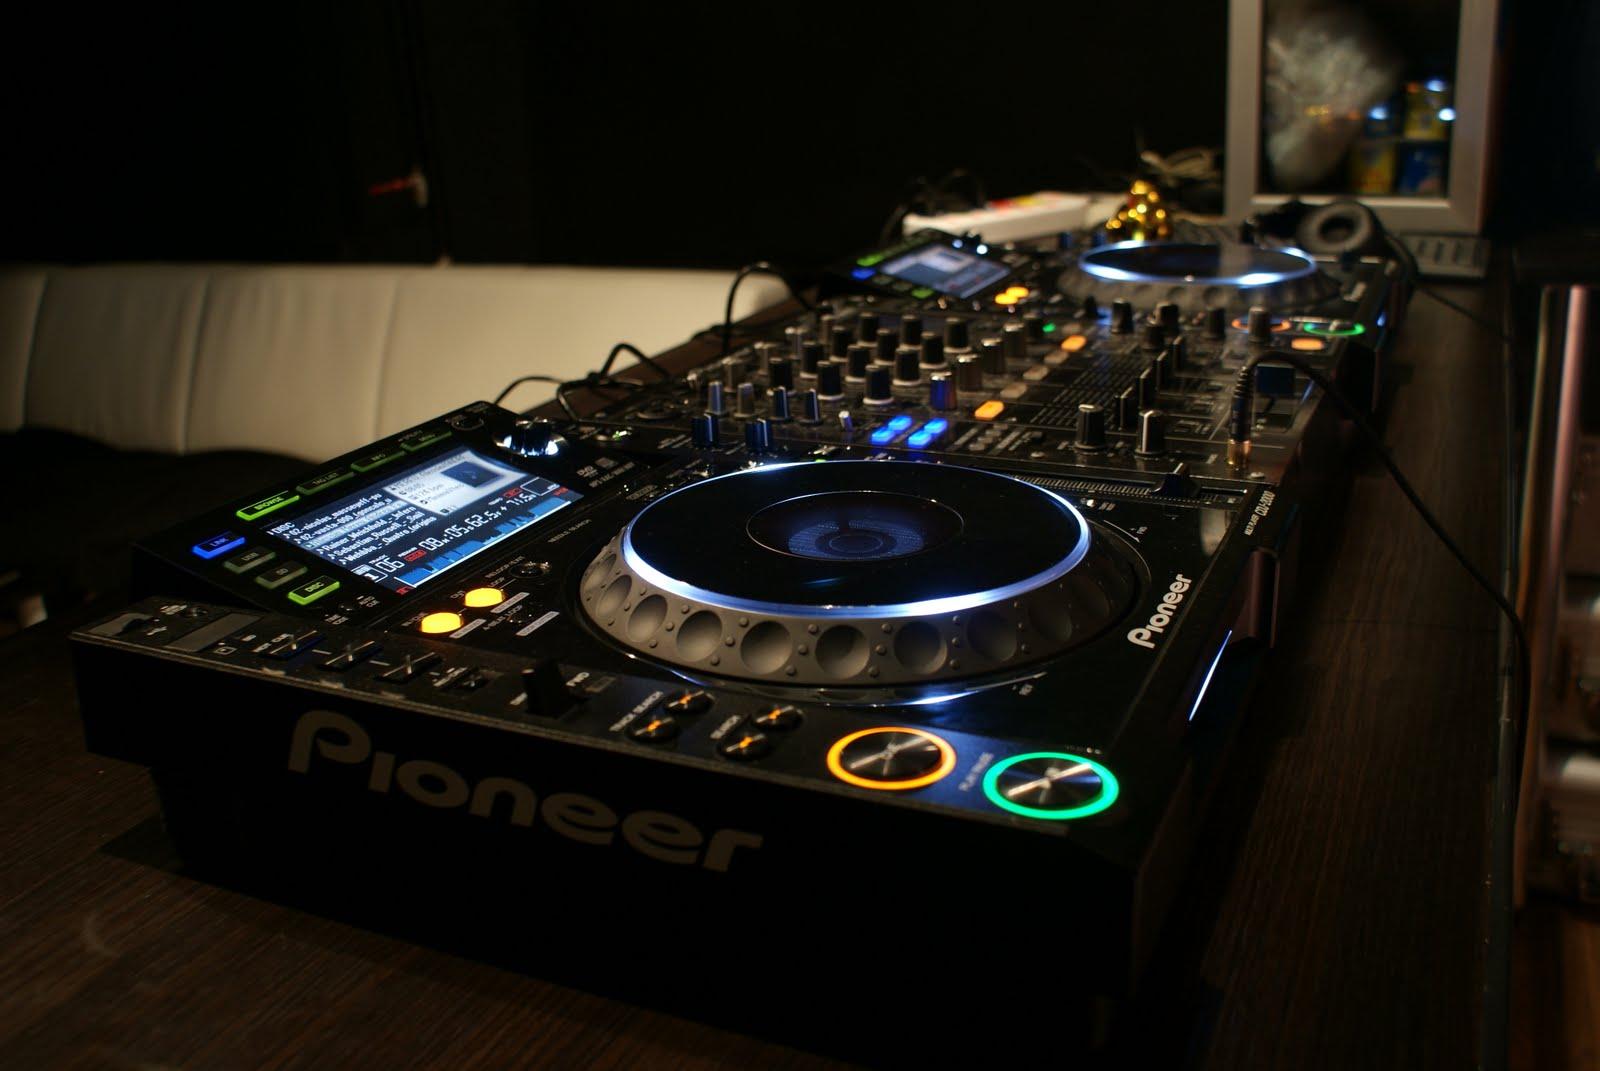 DJ Equipment For Beginners – 4 DJ Setups